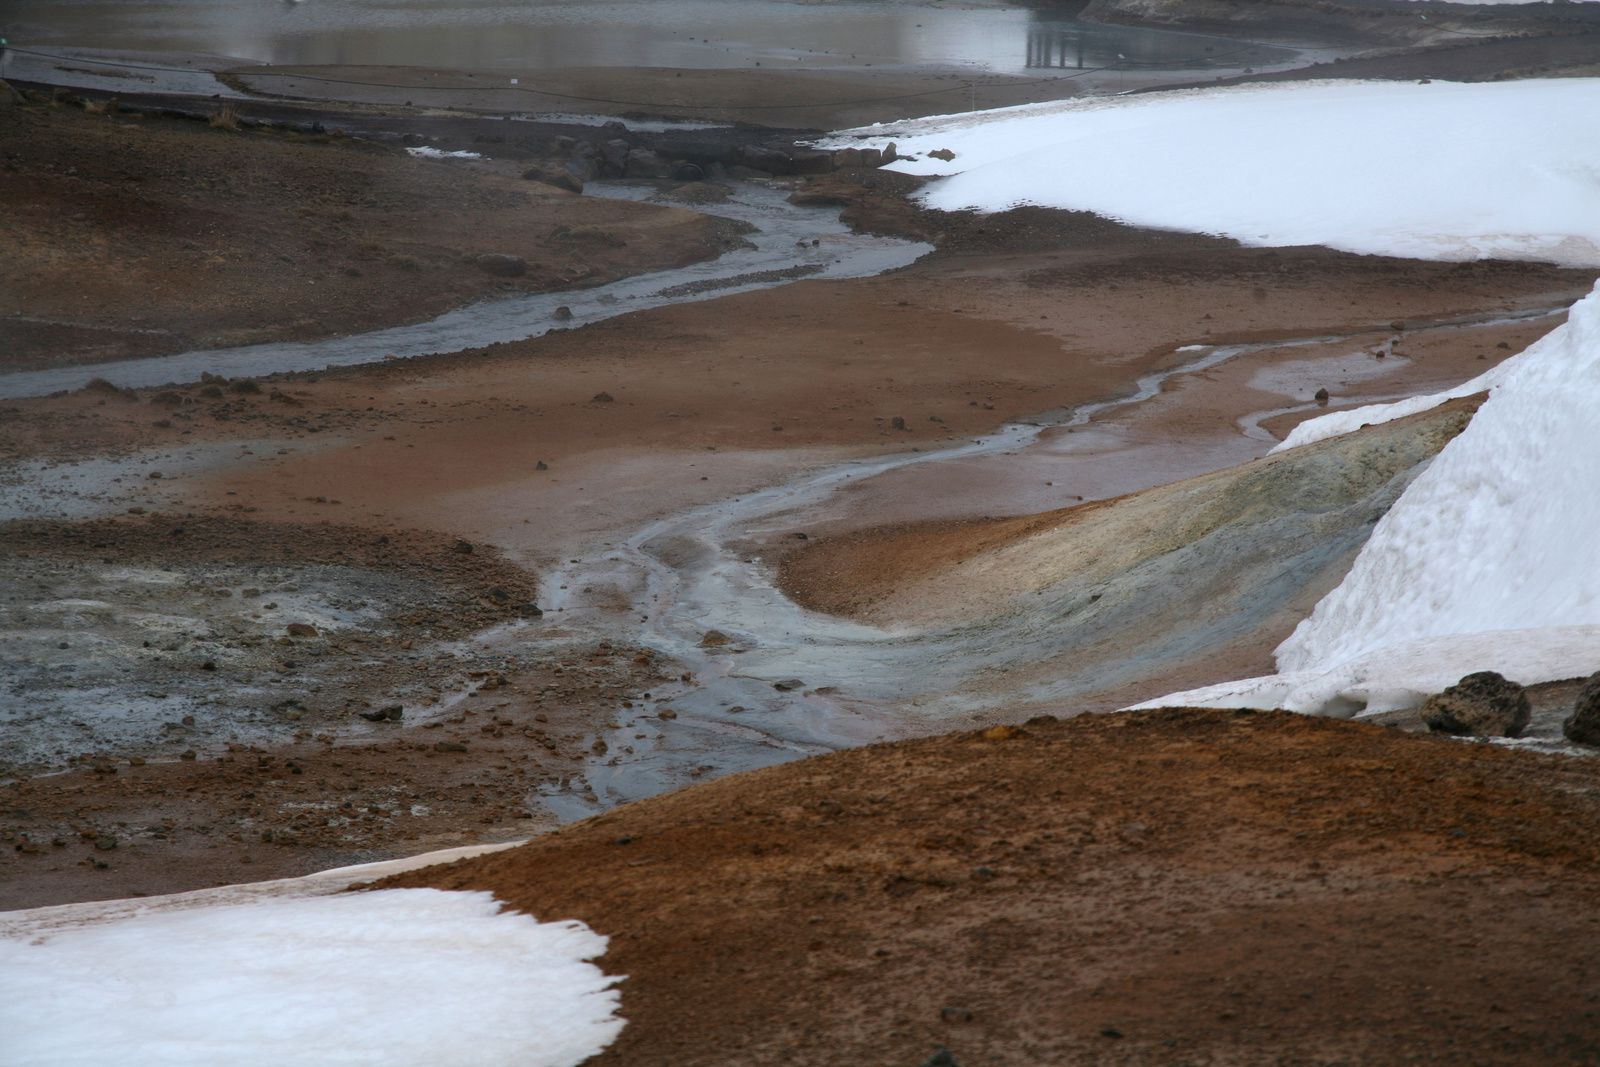 Le champ géothermal de Krísuvík-Seltún - photo © Bernard Duyck 2015